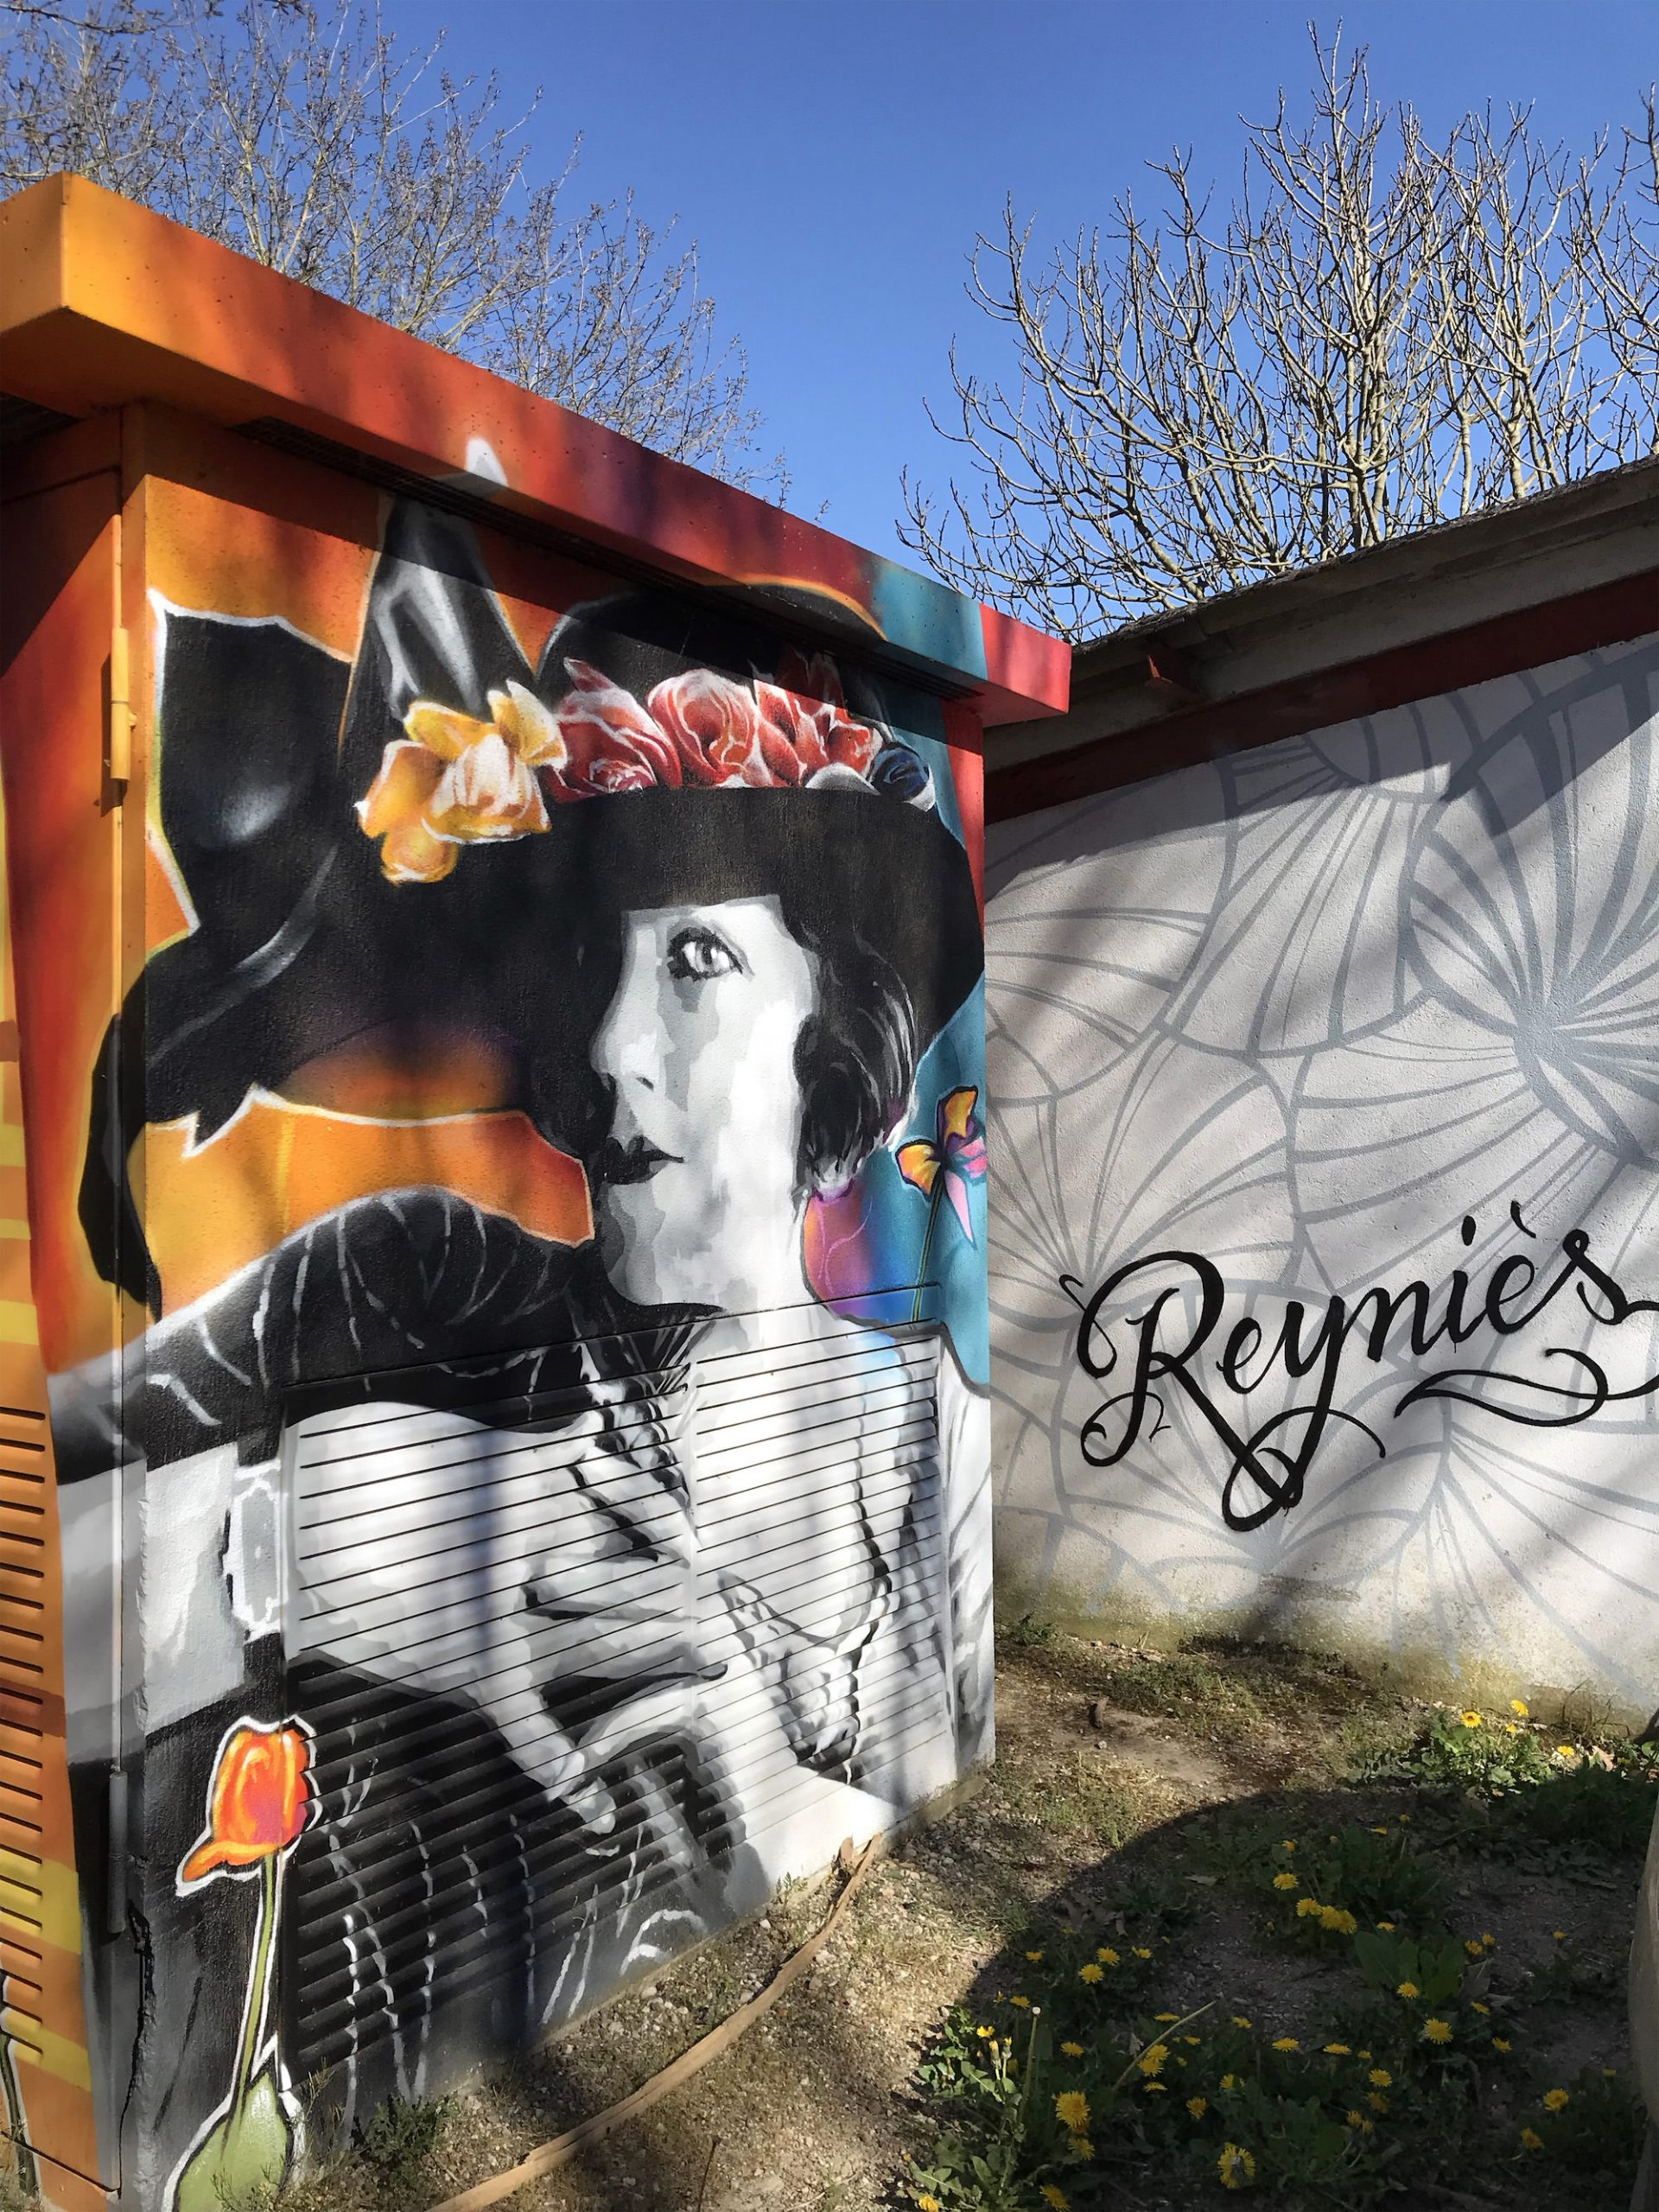 Reynies transformateur art nouveau graffiti